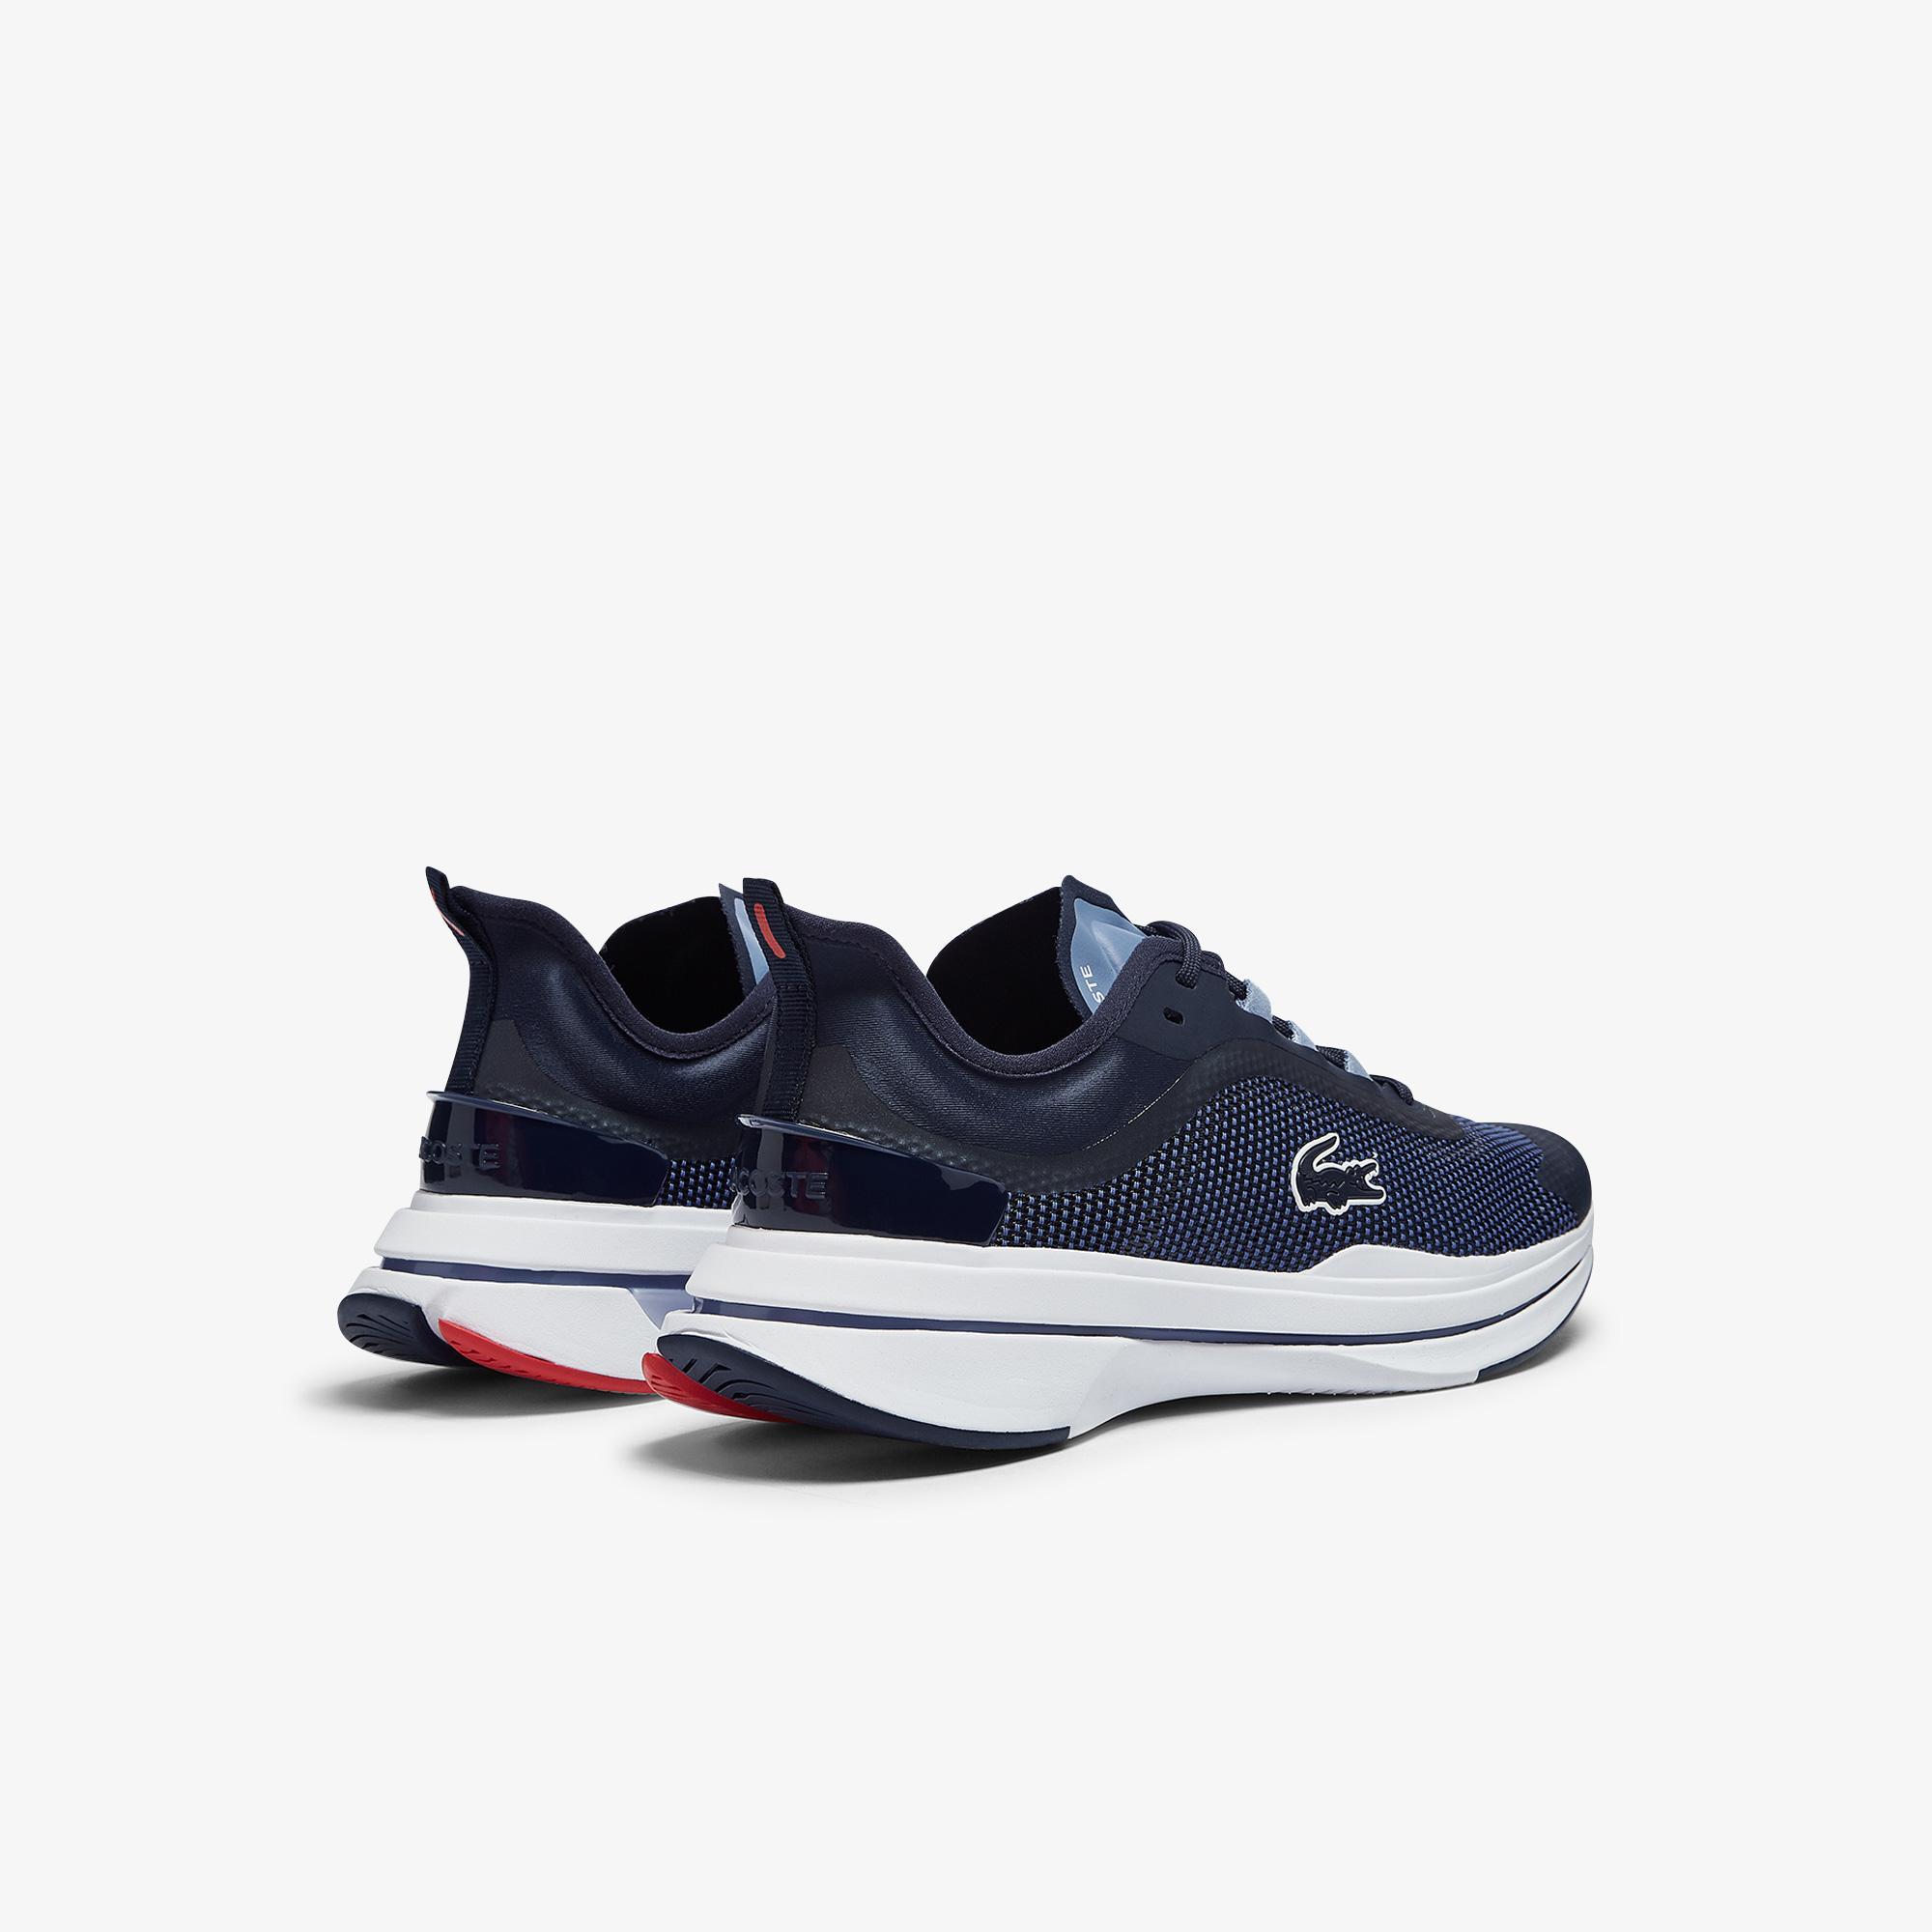 Lacoste Run Spin Ultra 0921 1 Sma Erkek Mavi - Lacivert Sneaker